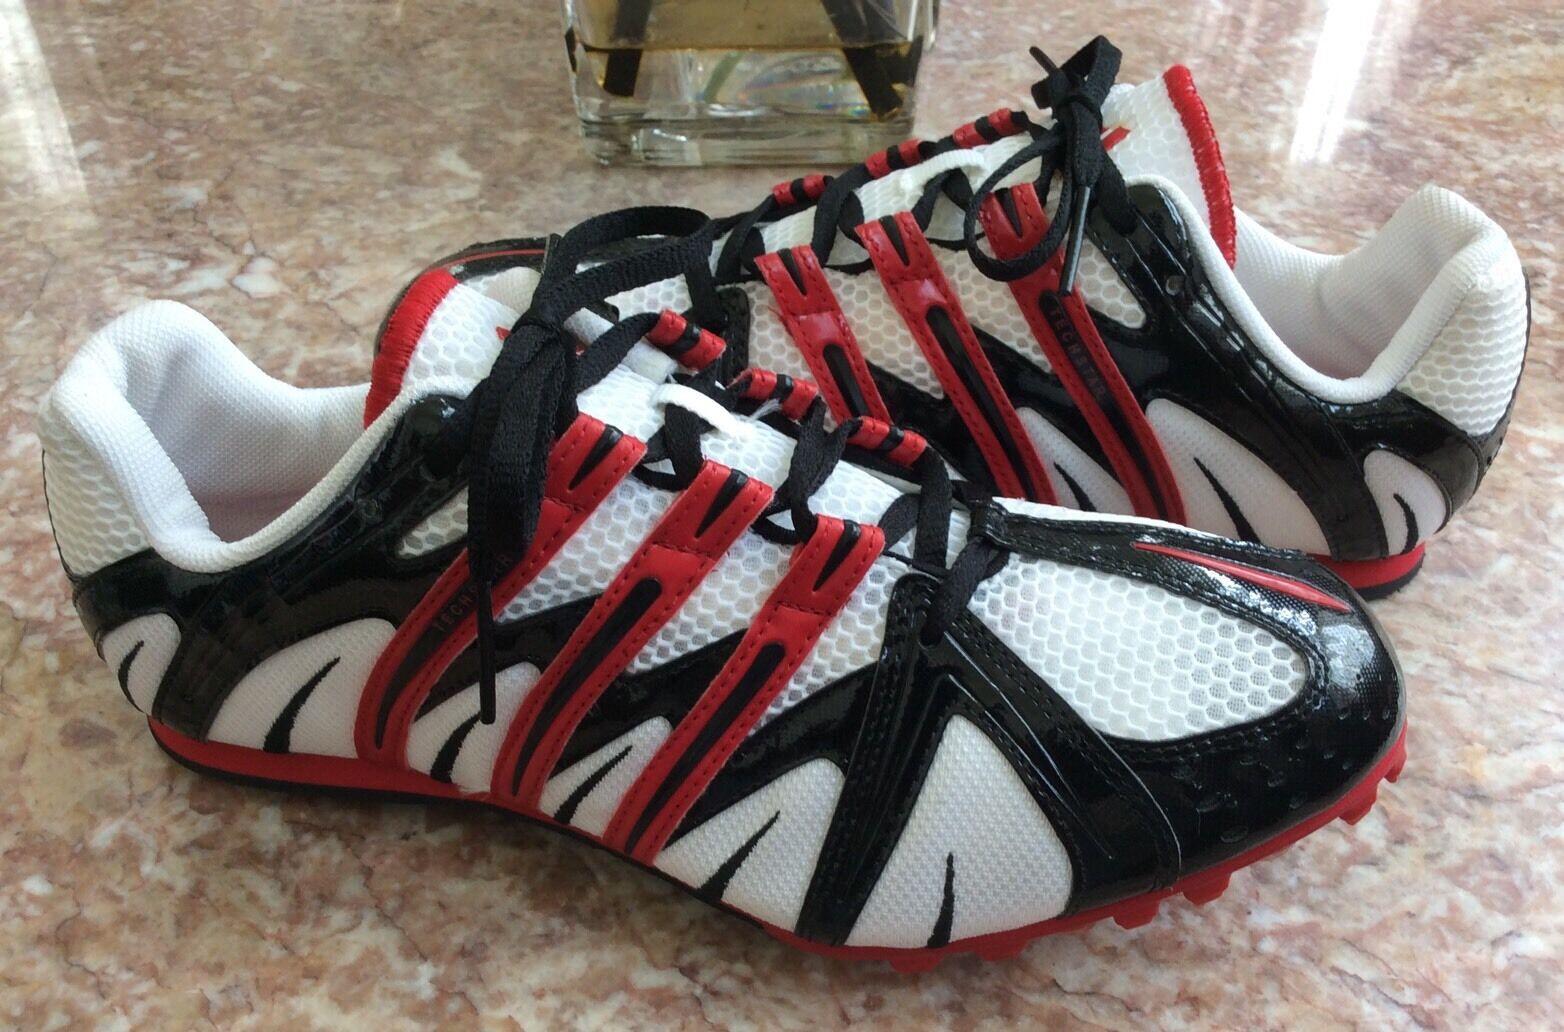 Nuove scarpe adidas techstar sprint traccia spuntoni uomini scarpe Nuove taglia 9,5 ostacoli racing 14b1f7